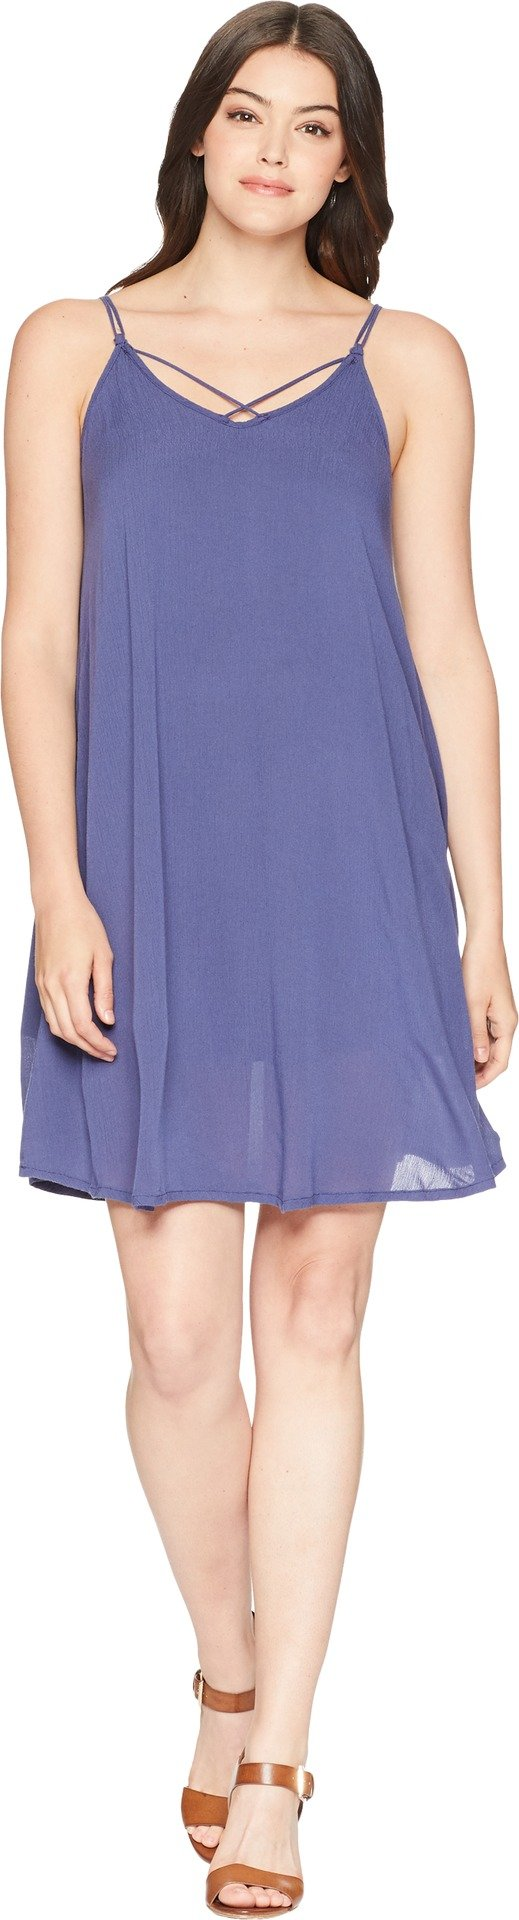 Roxy Junior's Half Year Old Dress, Crown Blue, L